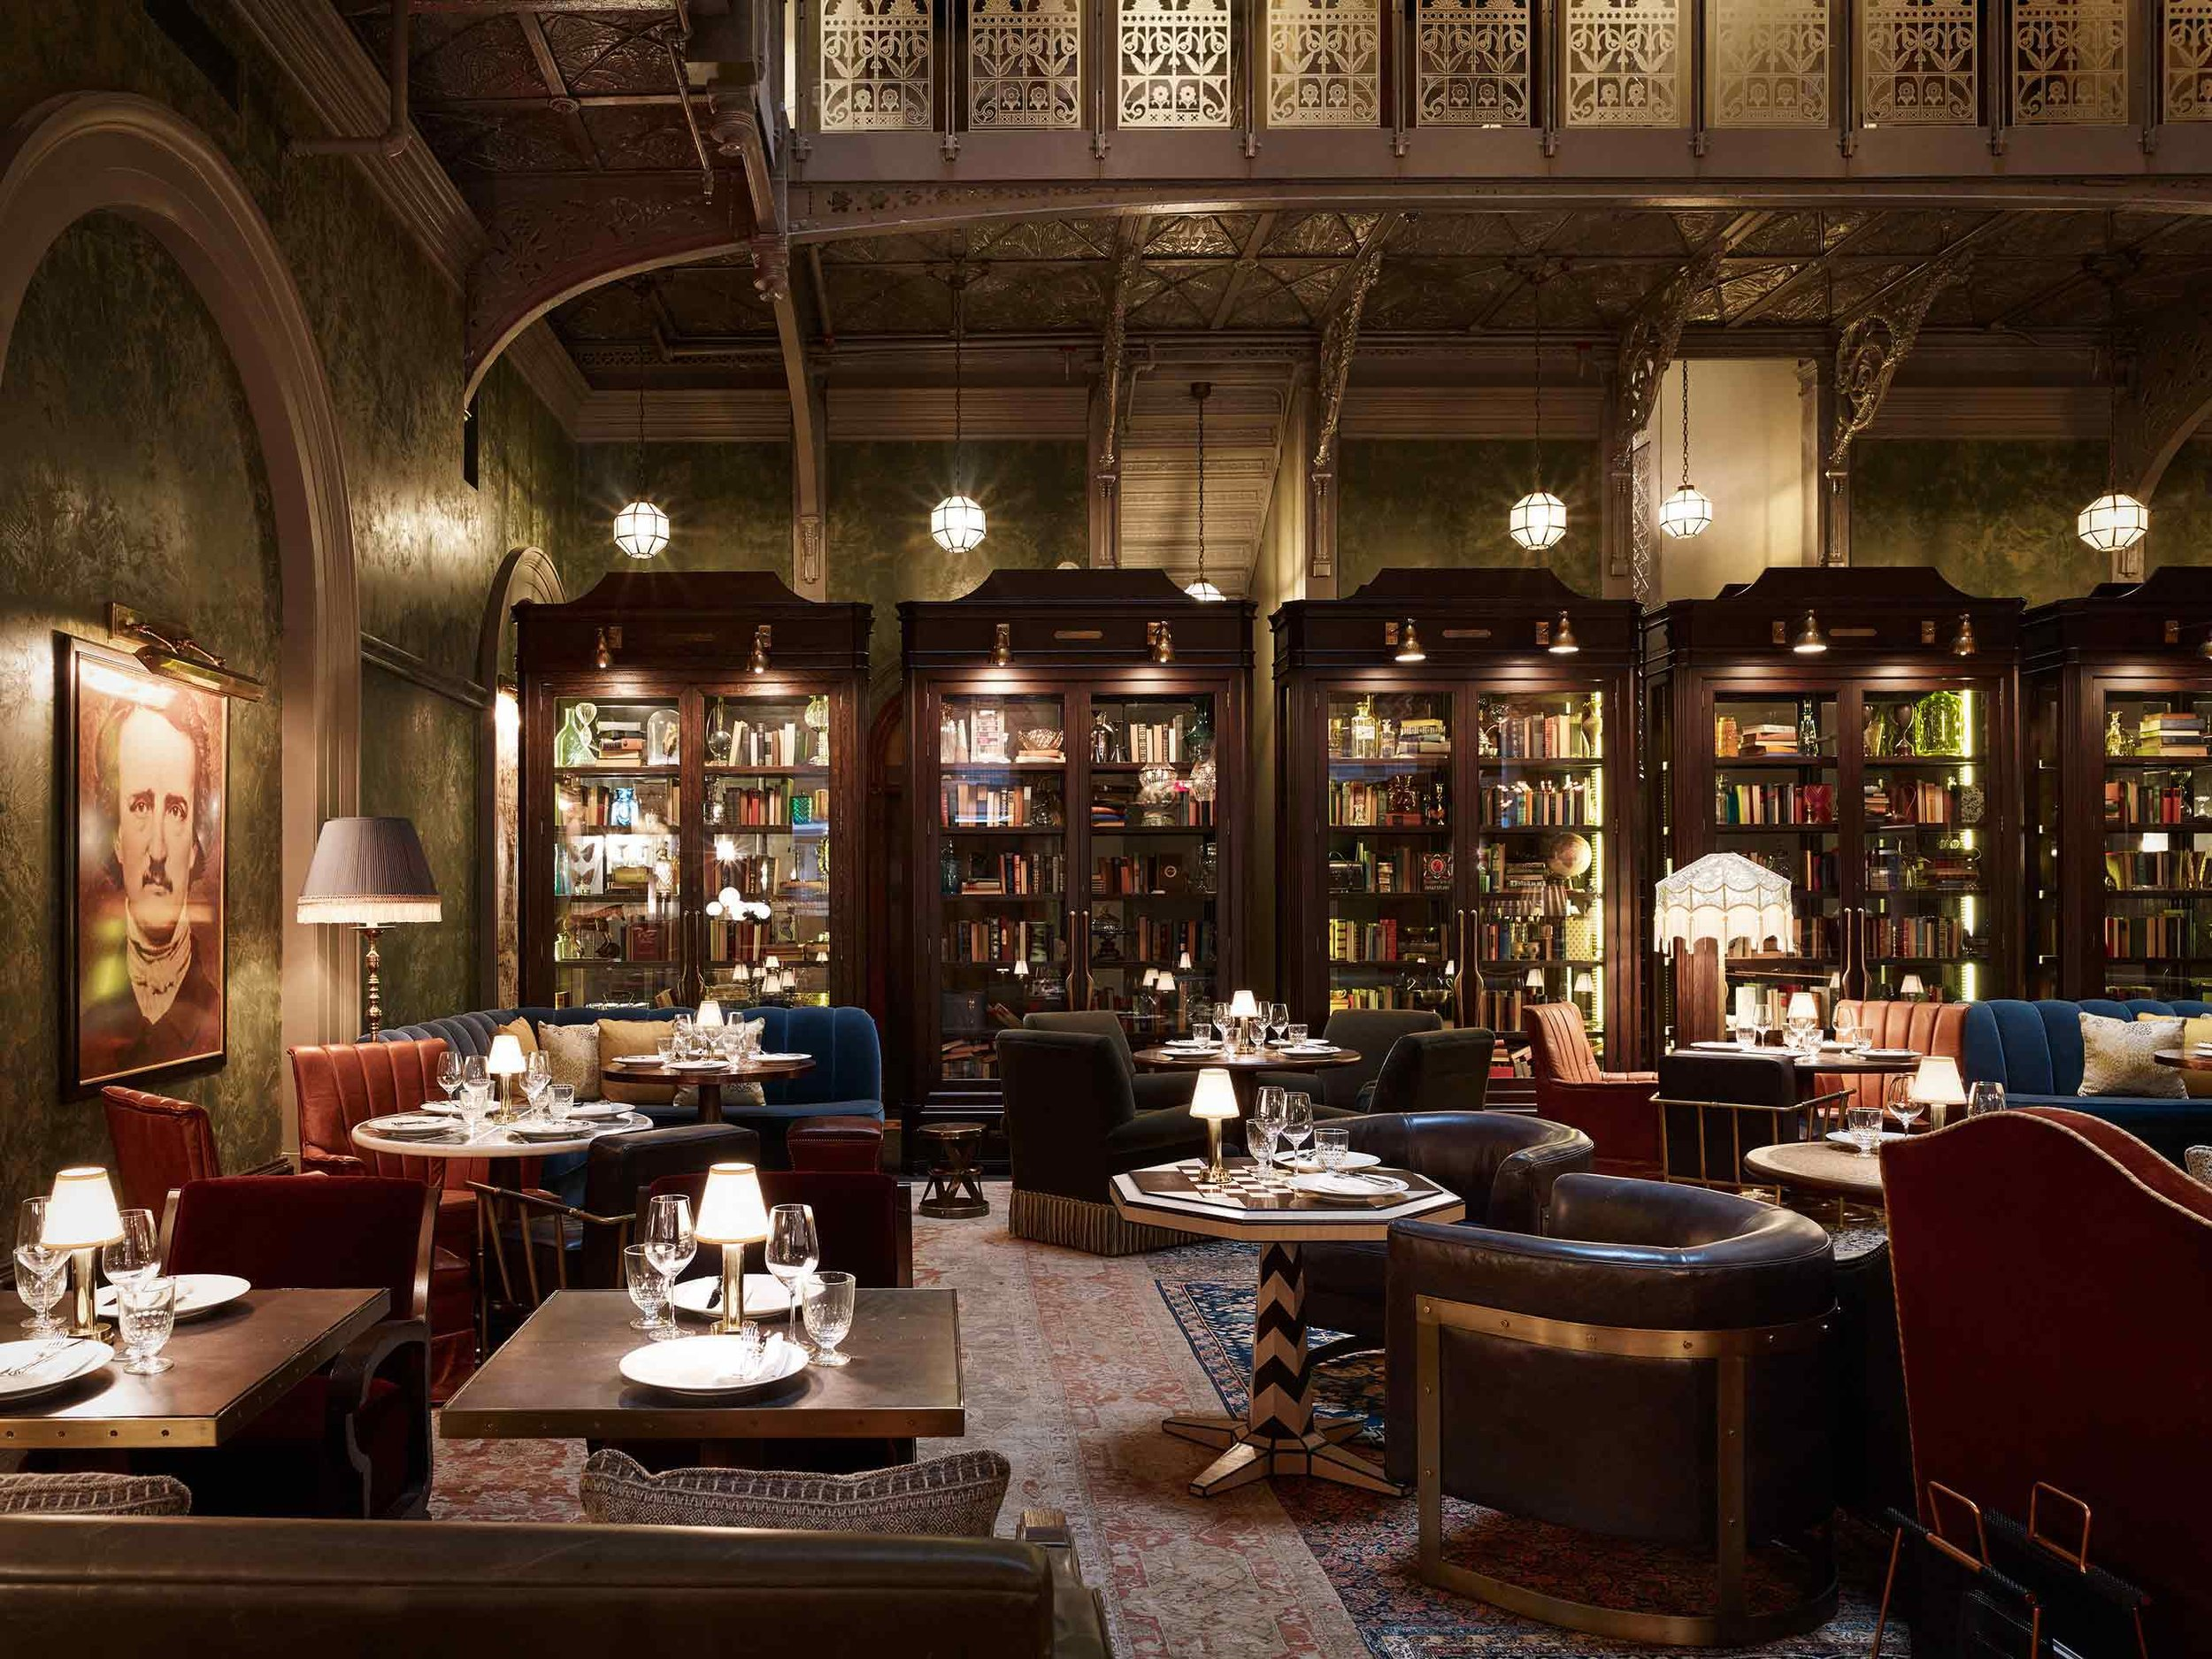 BEEKMAN HOTEL, NEW YORK CITY